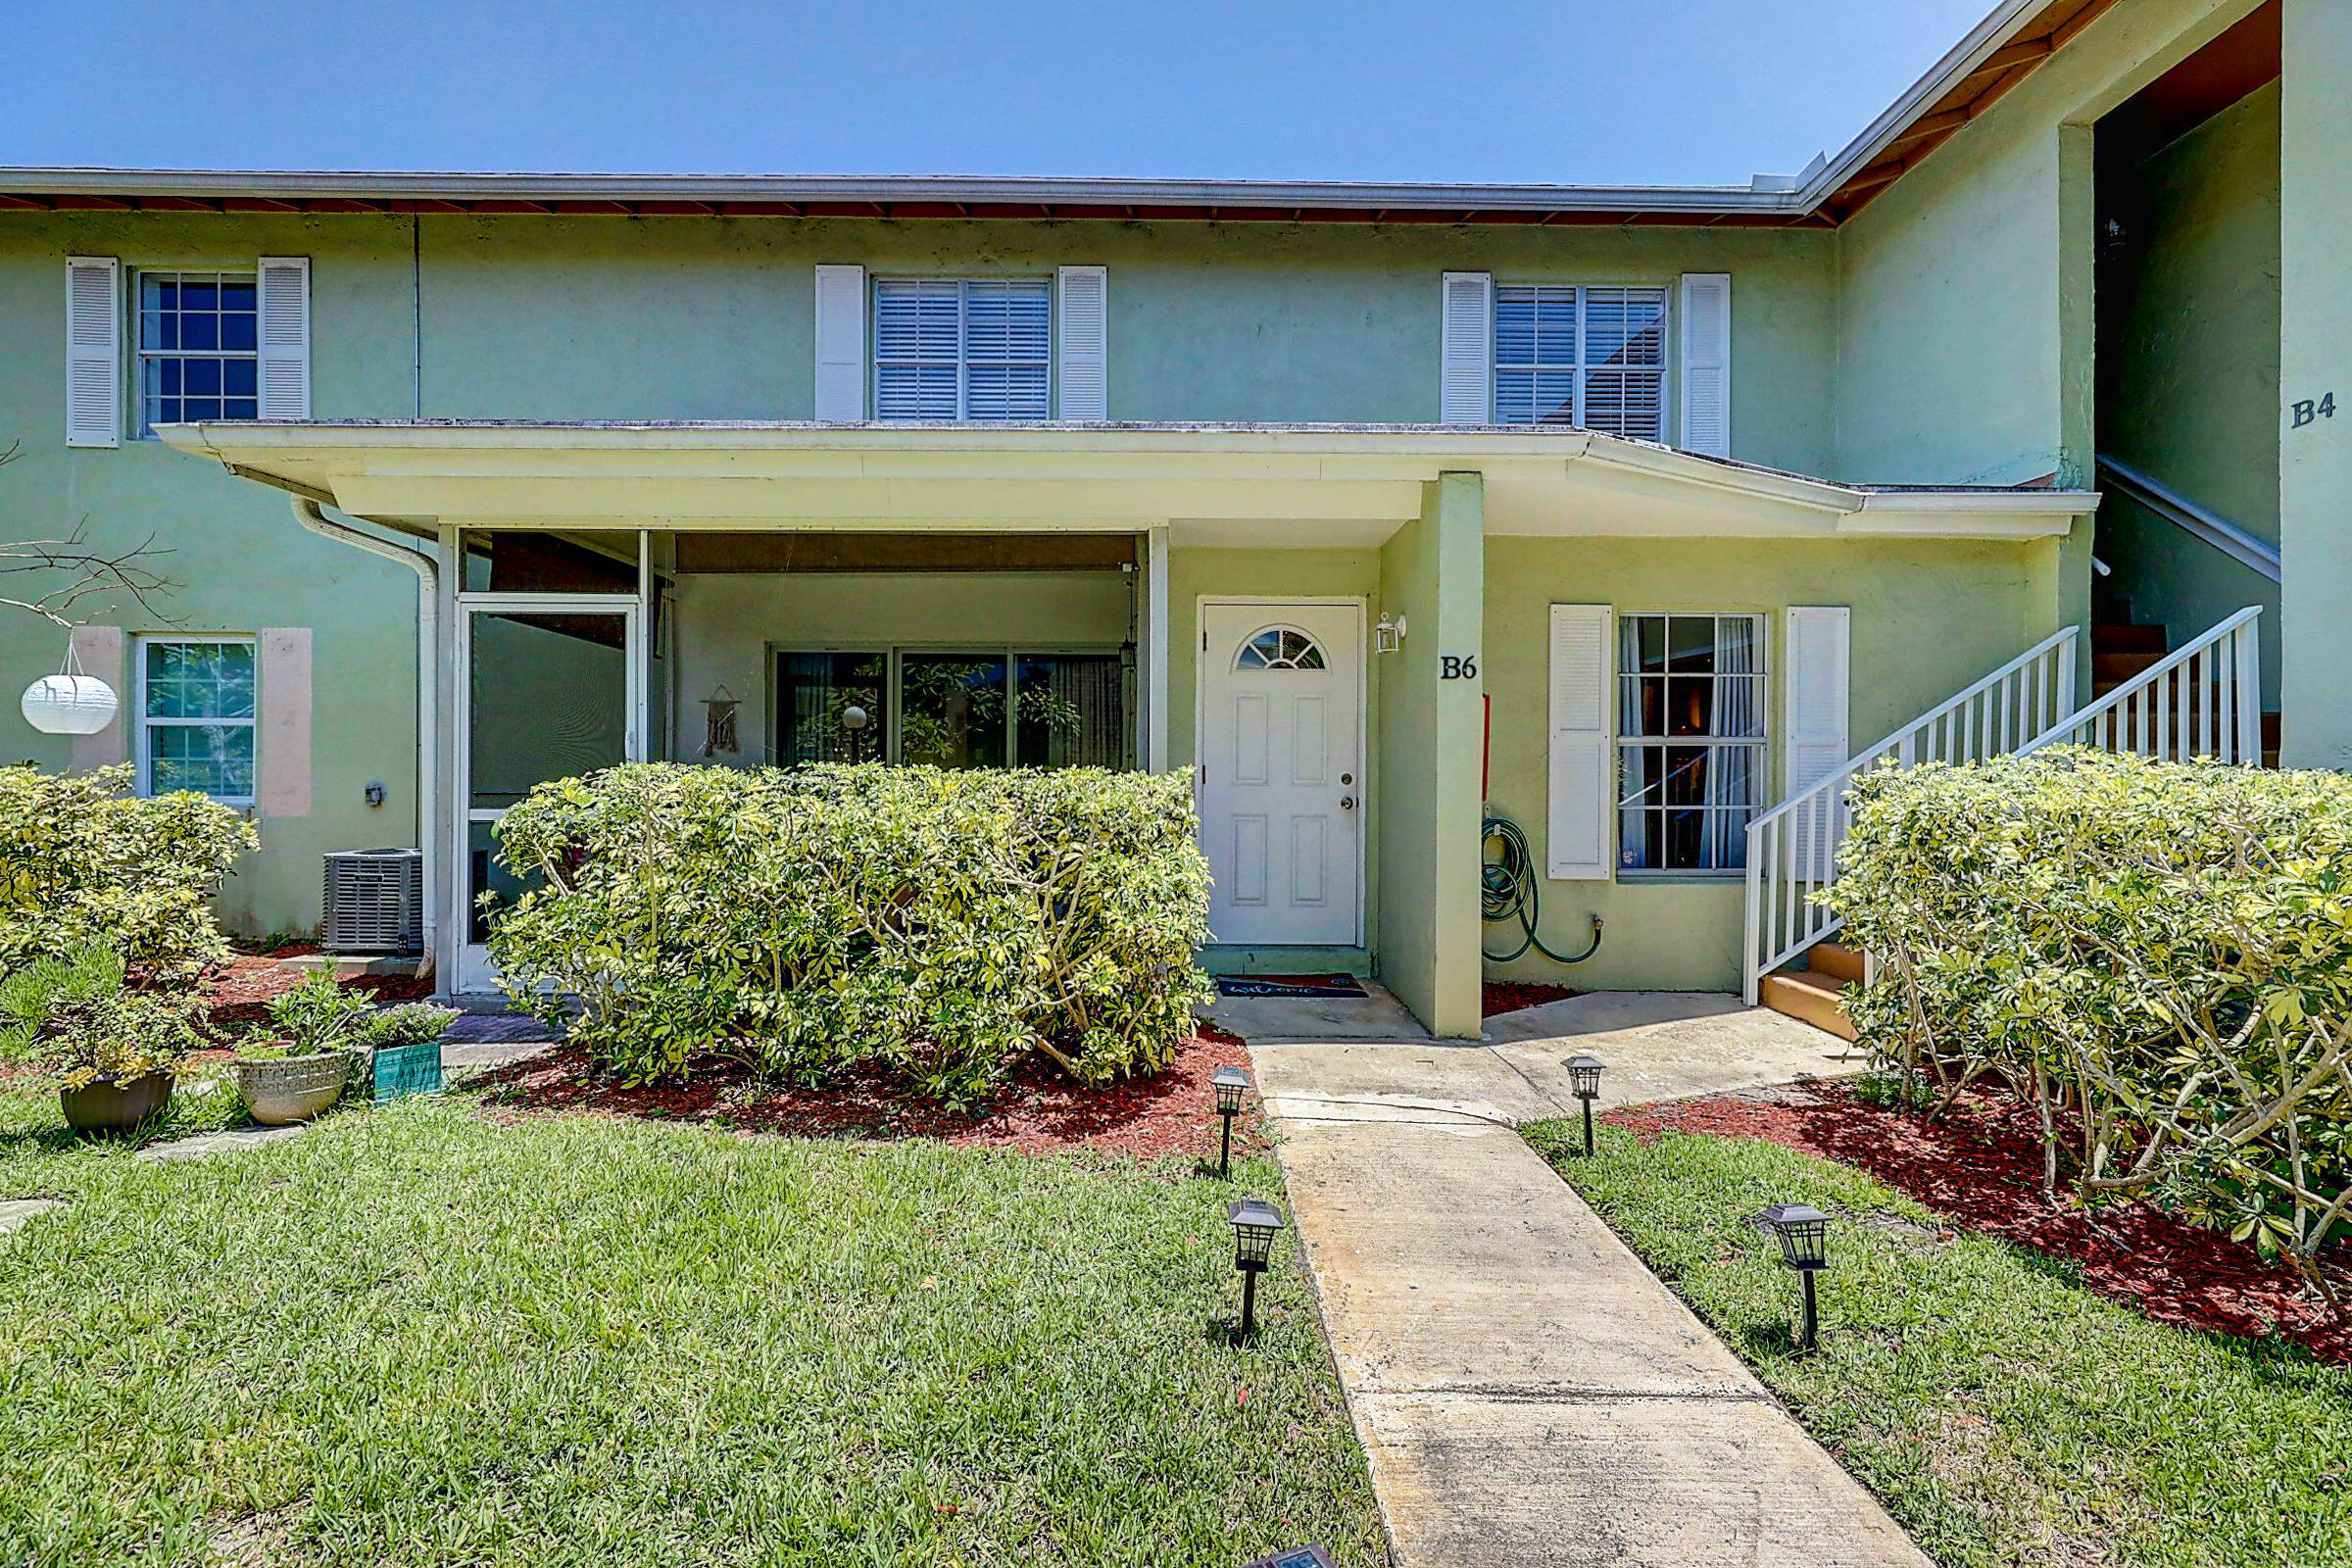 12036 Alternate A1a B6 Palm Beach Gardens, FL 33410